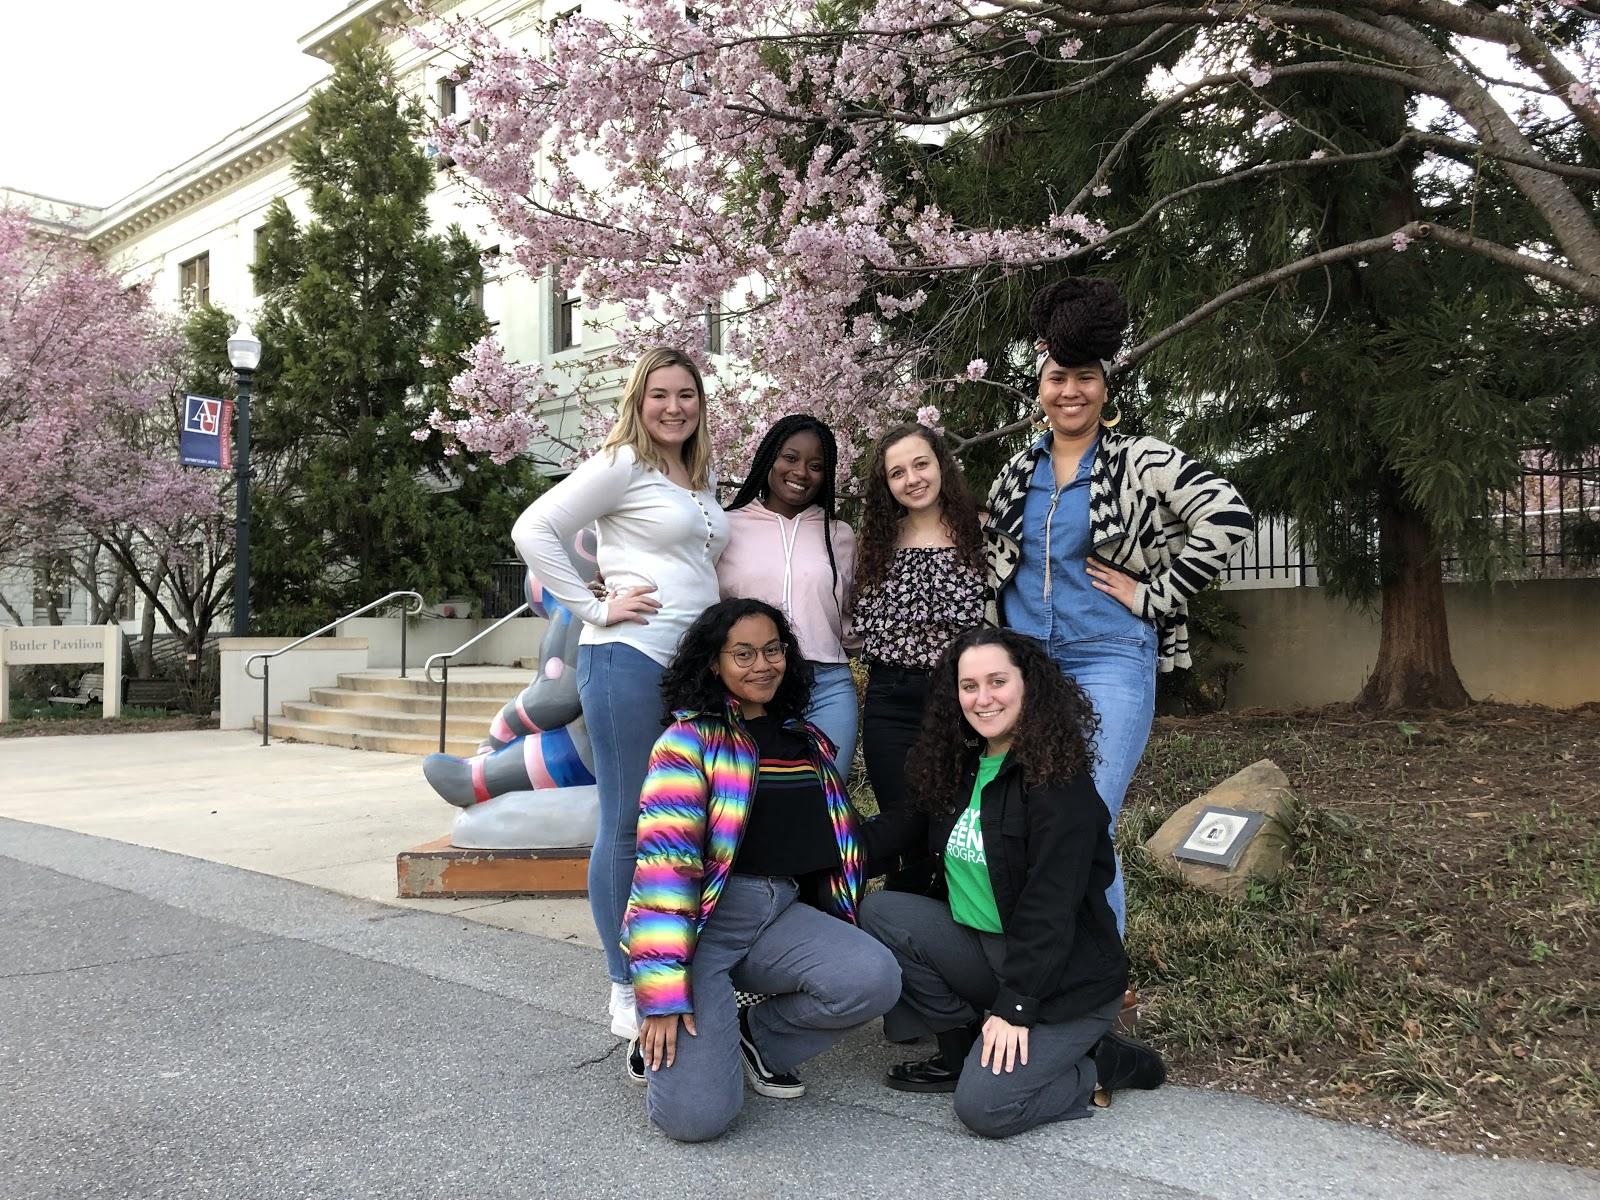 Triota's executive board from L-R: Katie Kaschub, Shelby Moring, April Emokpae, Dana Colarocco, Elana Lipkin, Miriam Starobin.